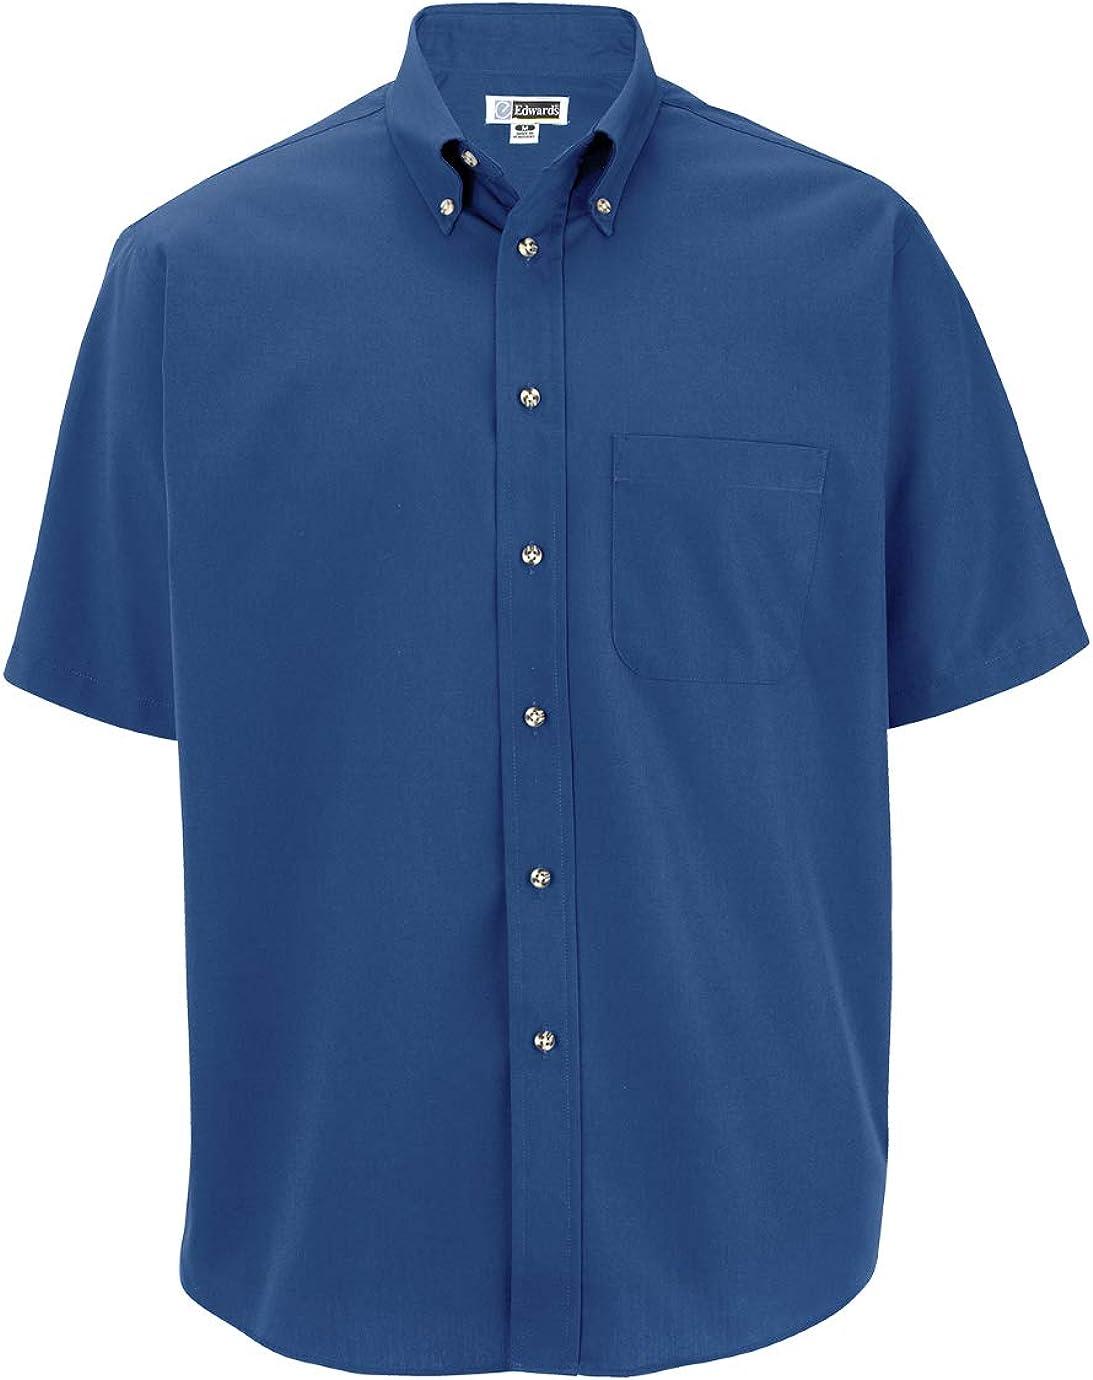 Edwards Mens Easy Care Short Sleeve POPLIN Shirt